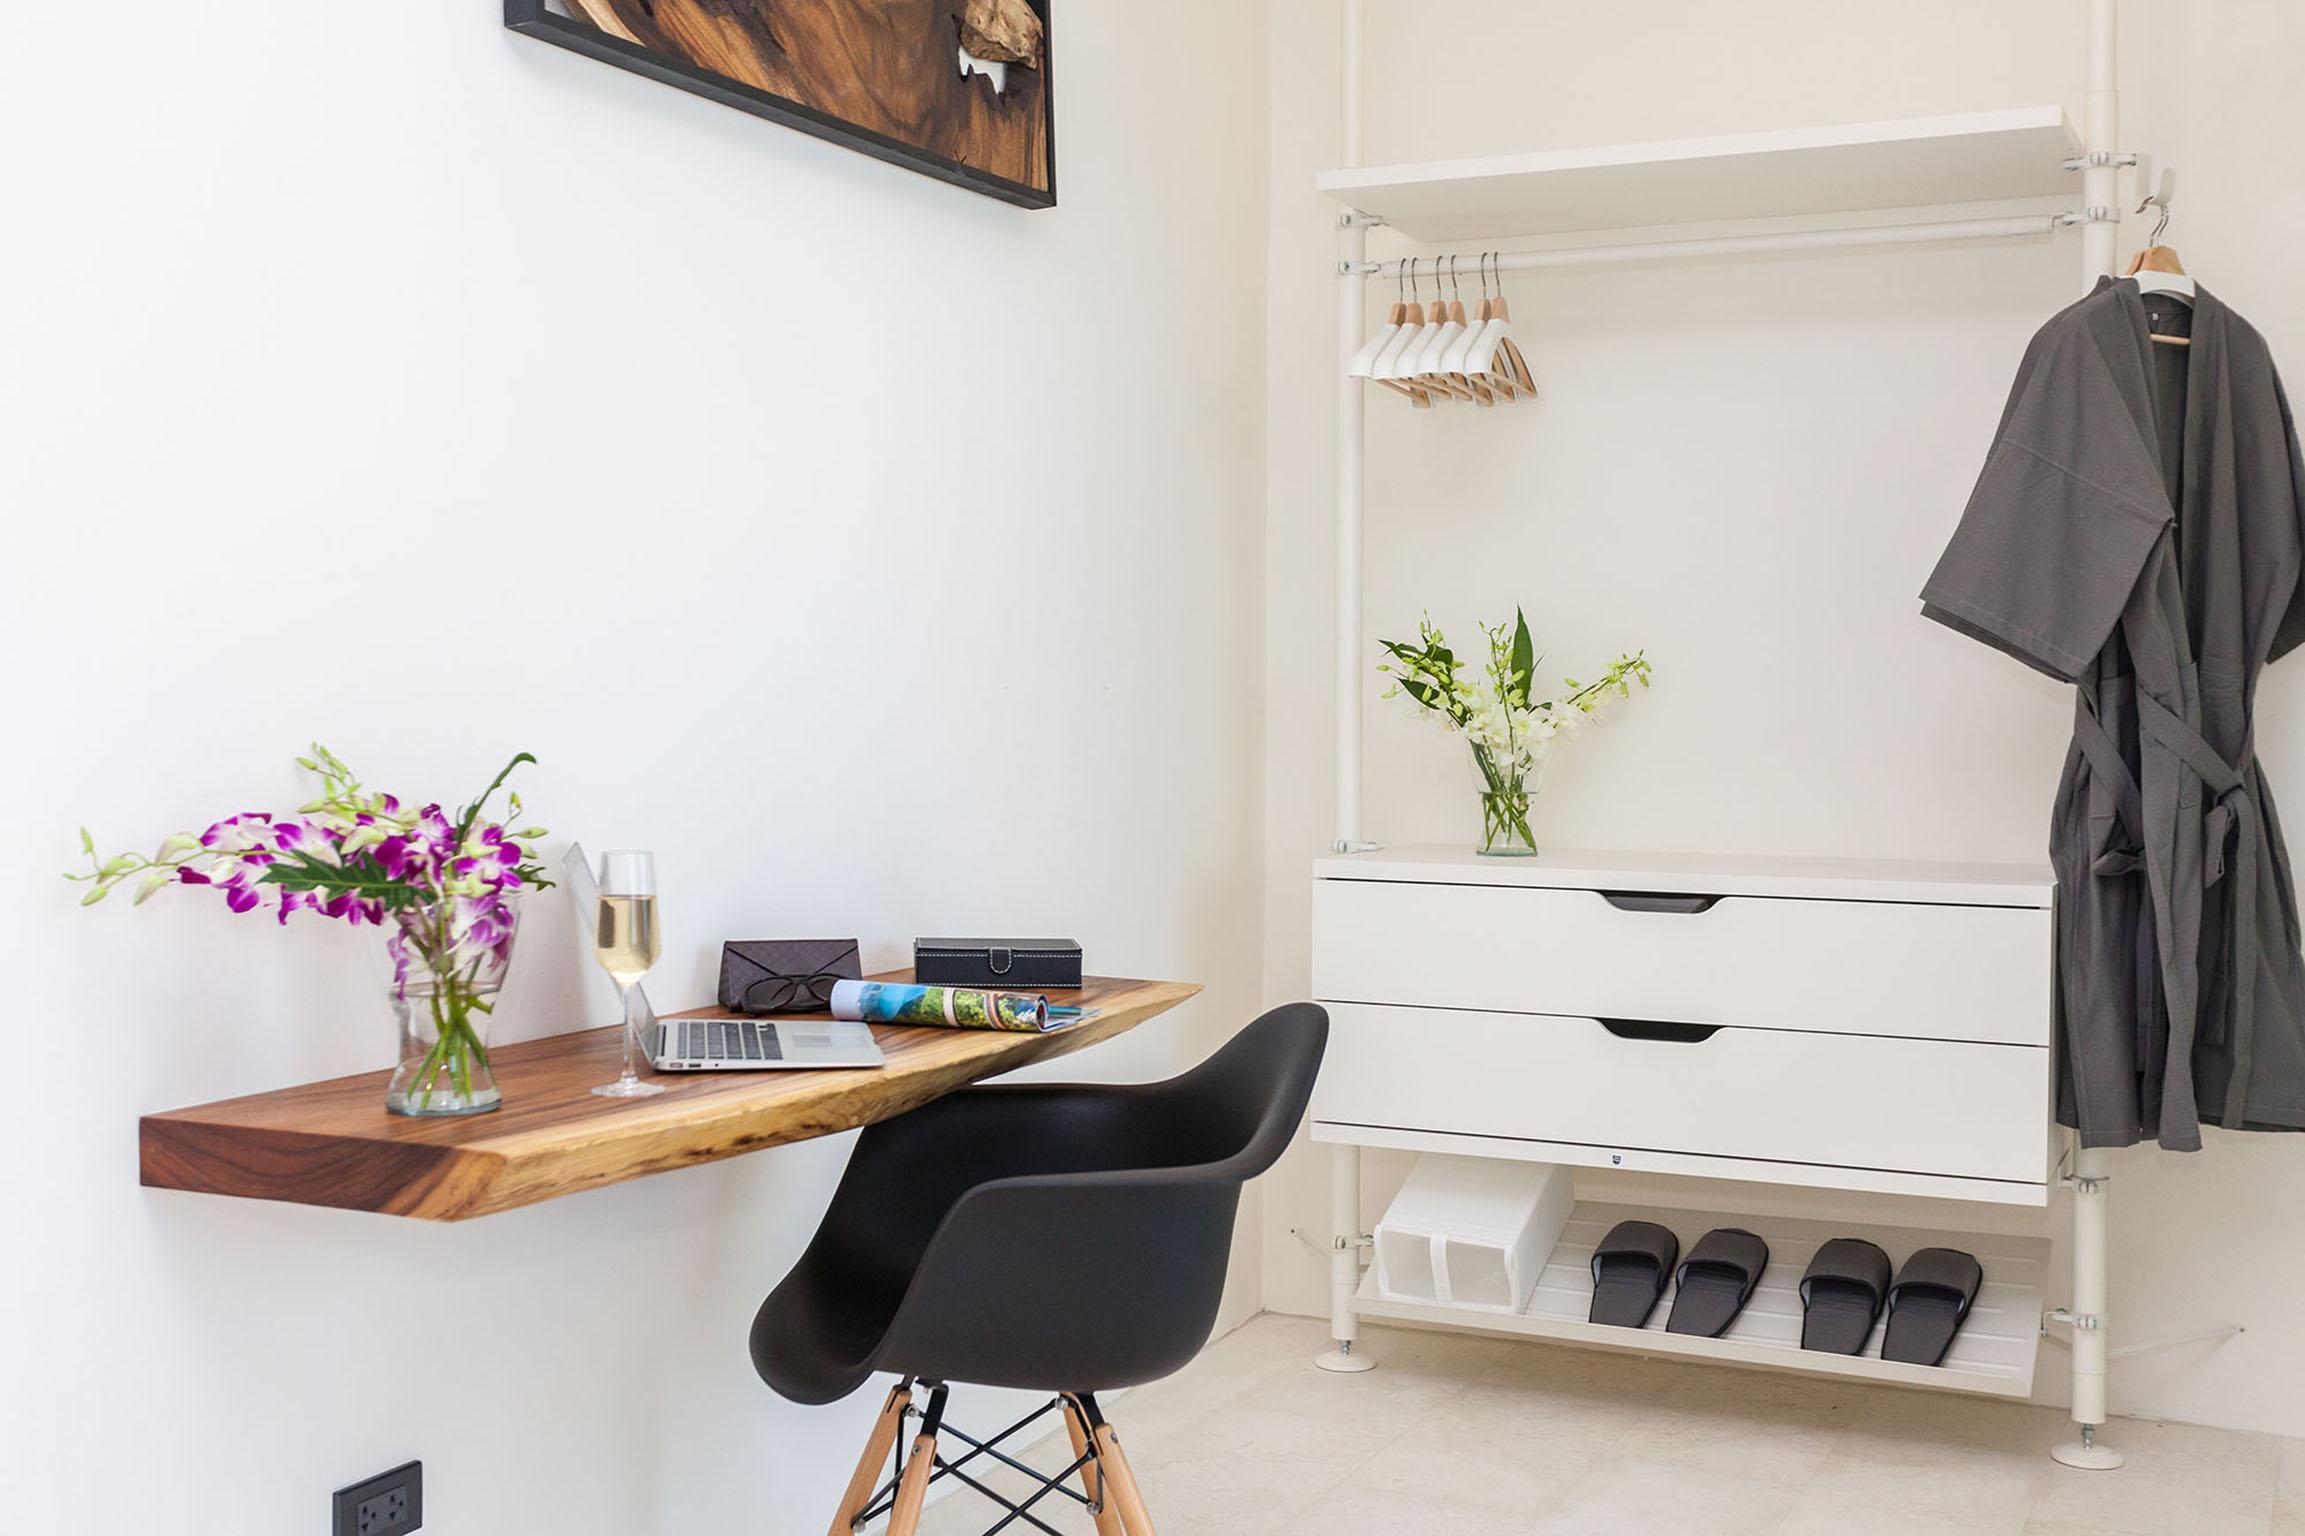 Wooden desk and wardrobe